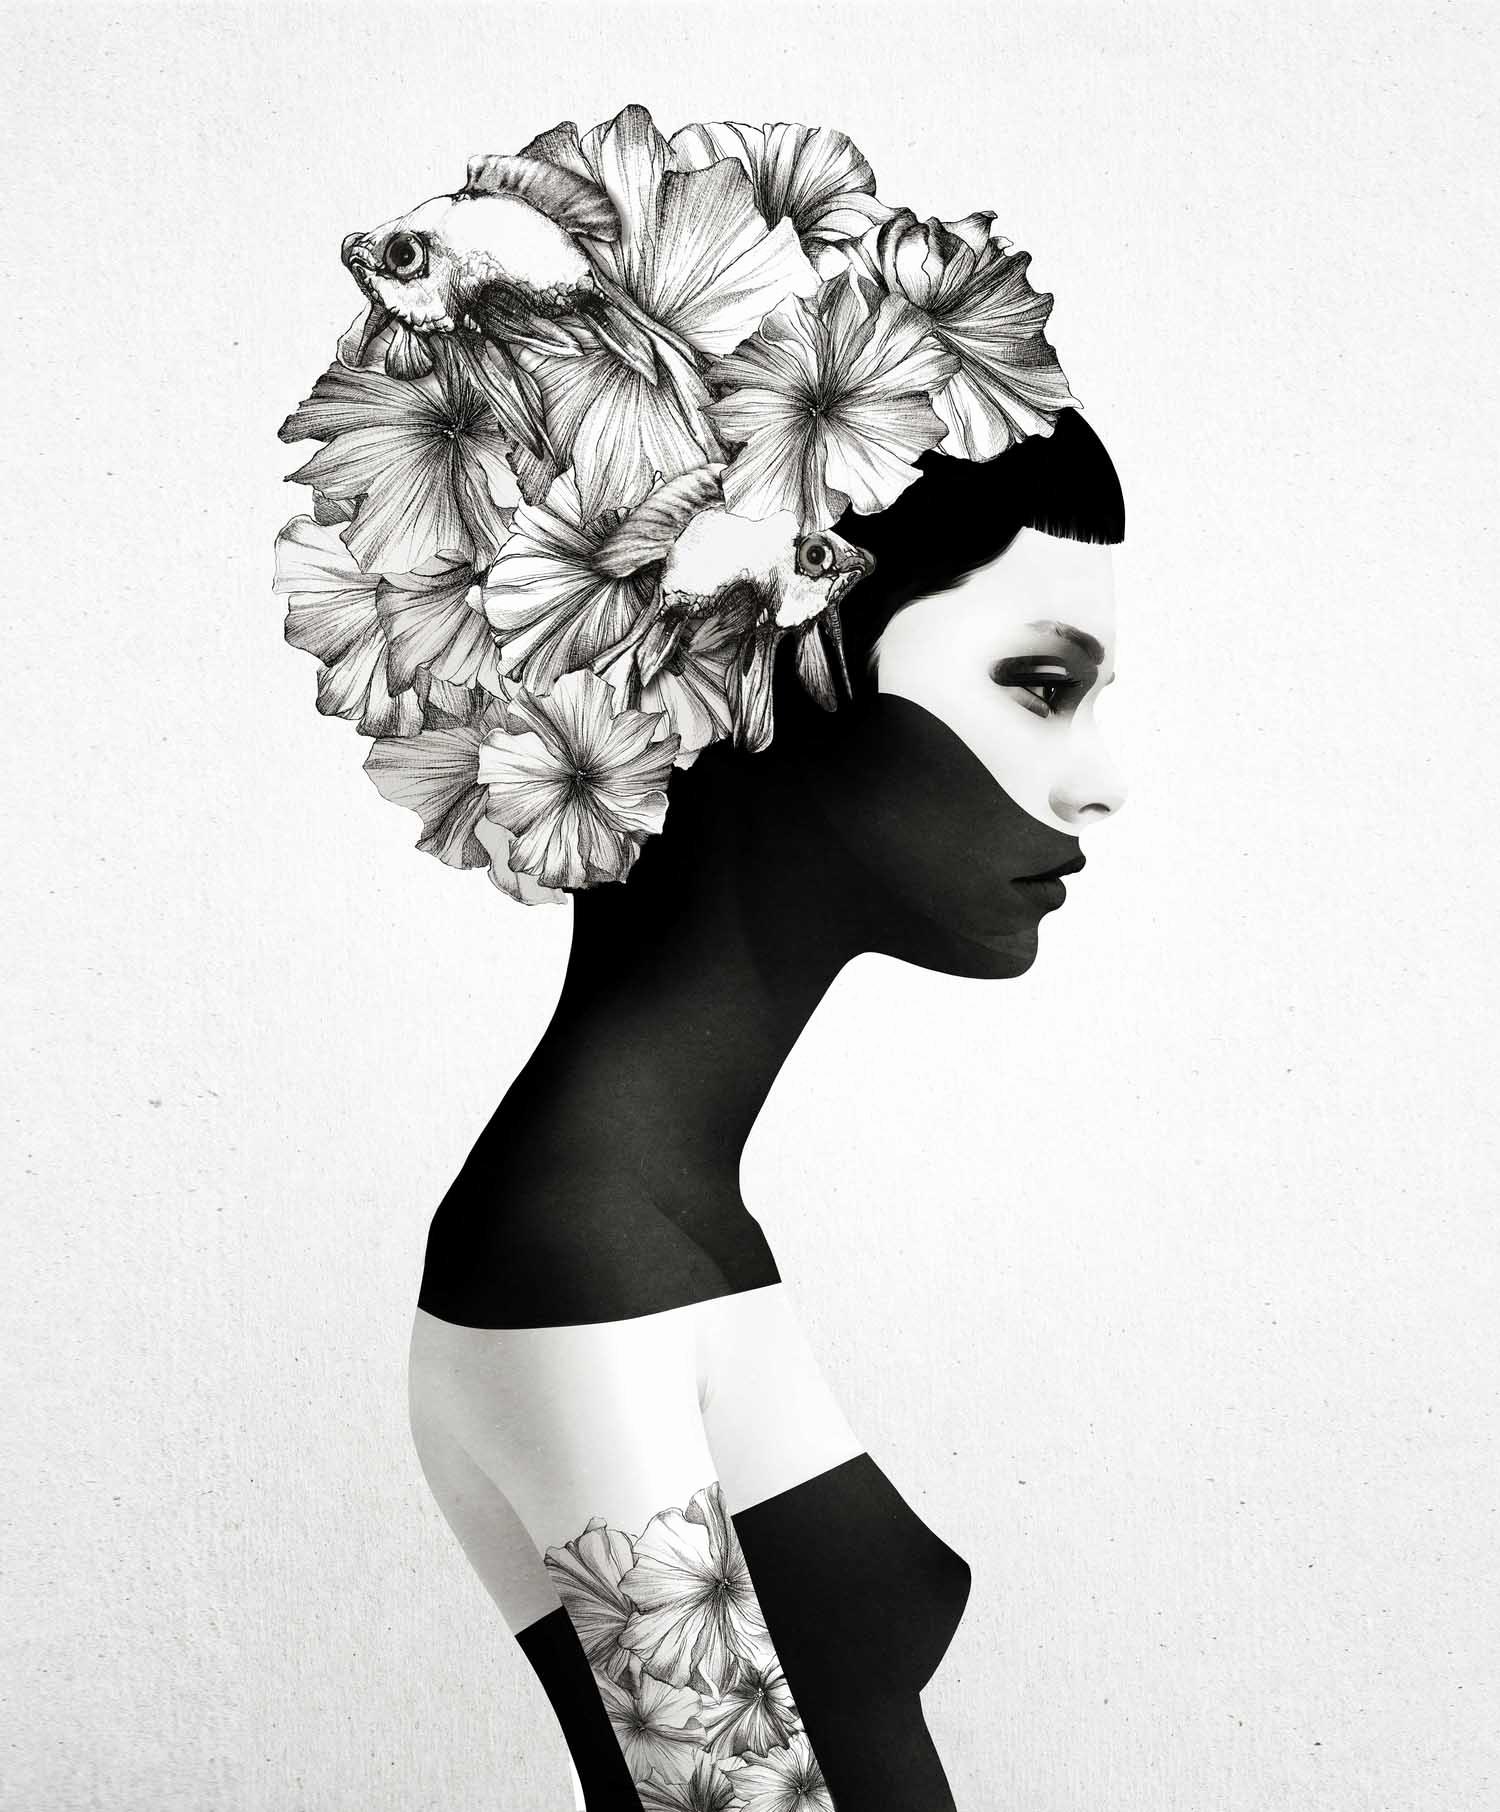 Black and White Illustration Lovely the Dark Imaginary World Of Ruben Ireland